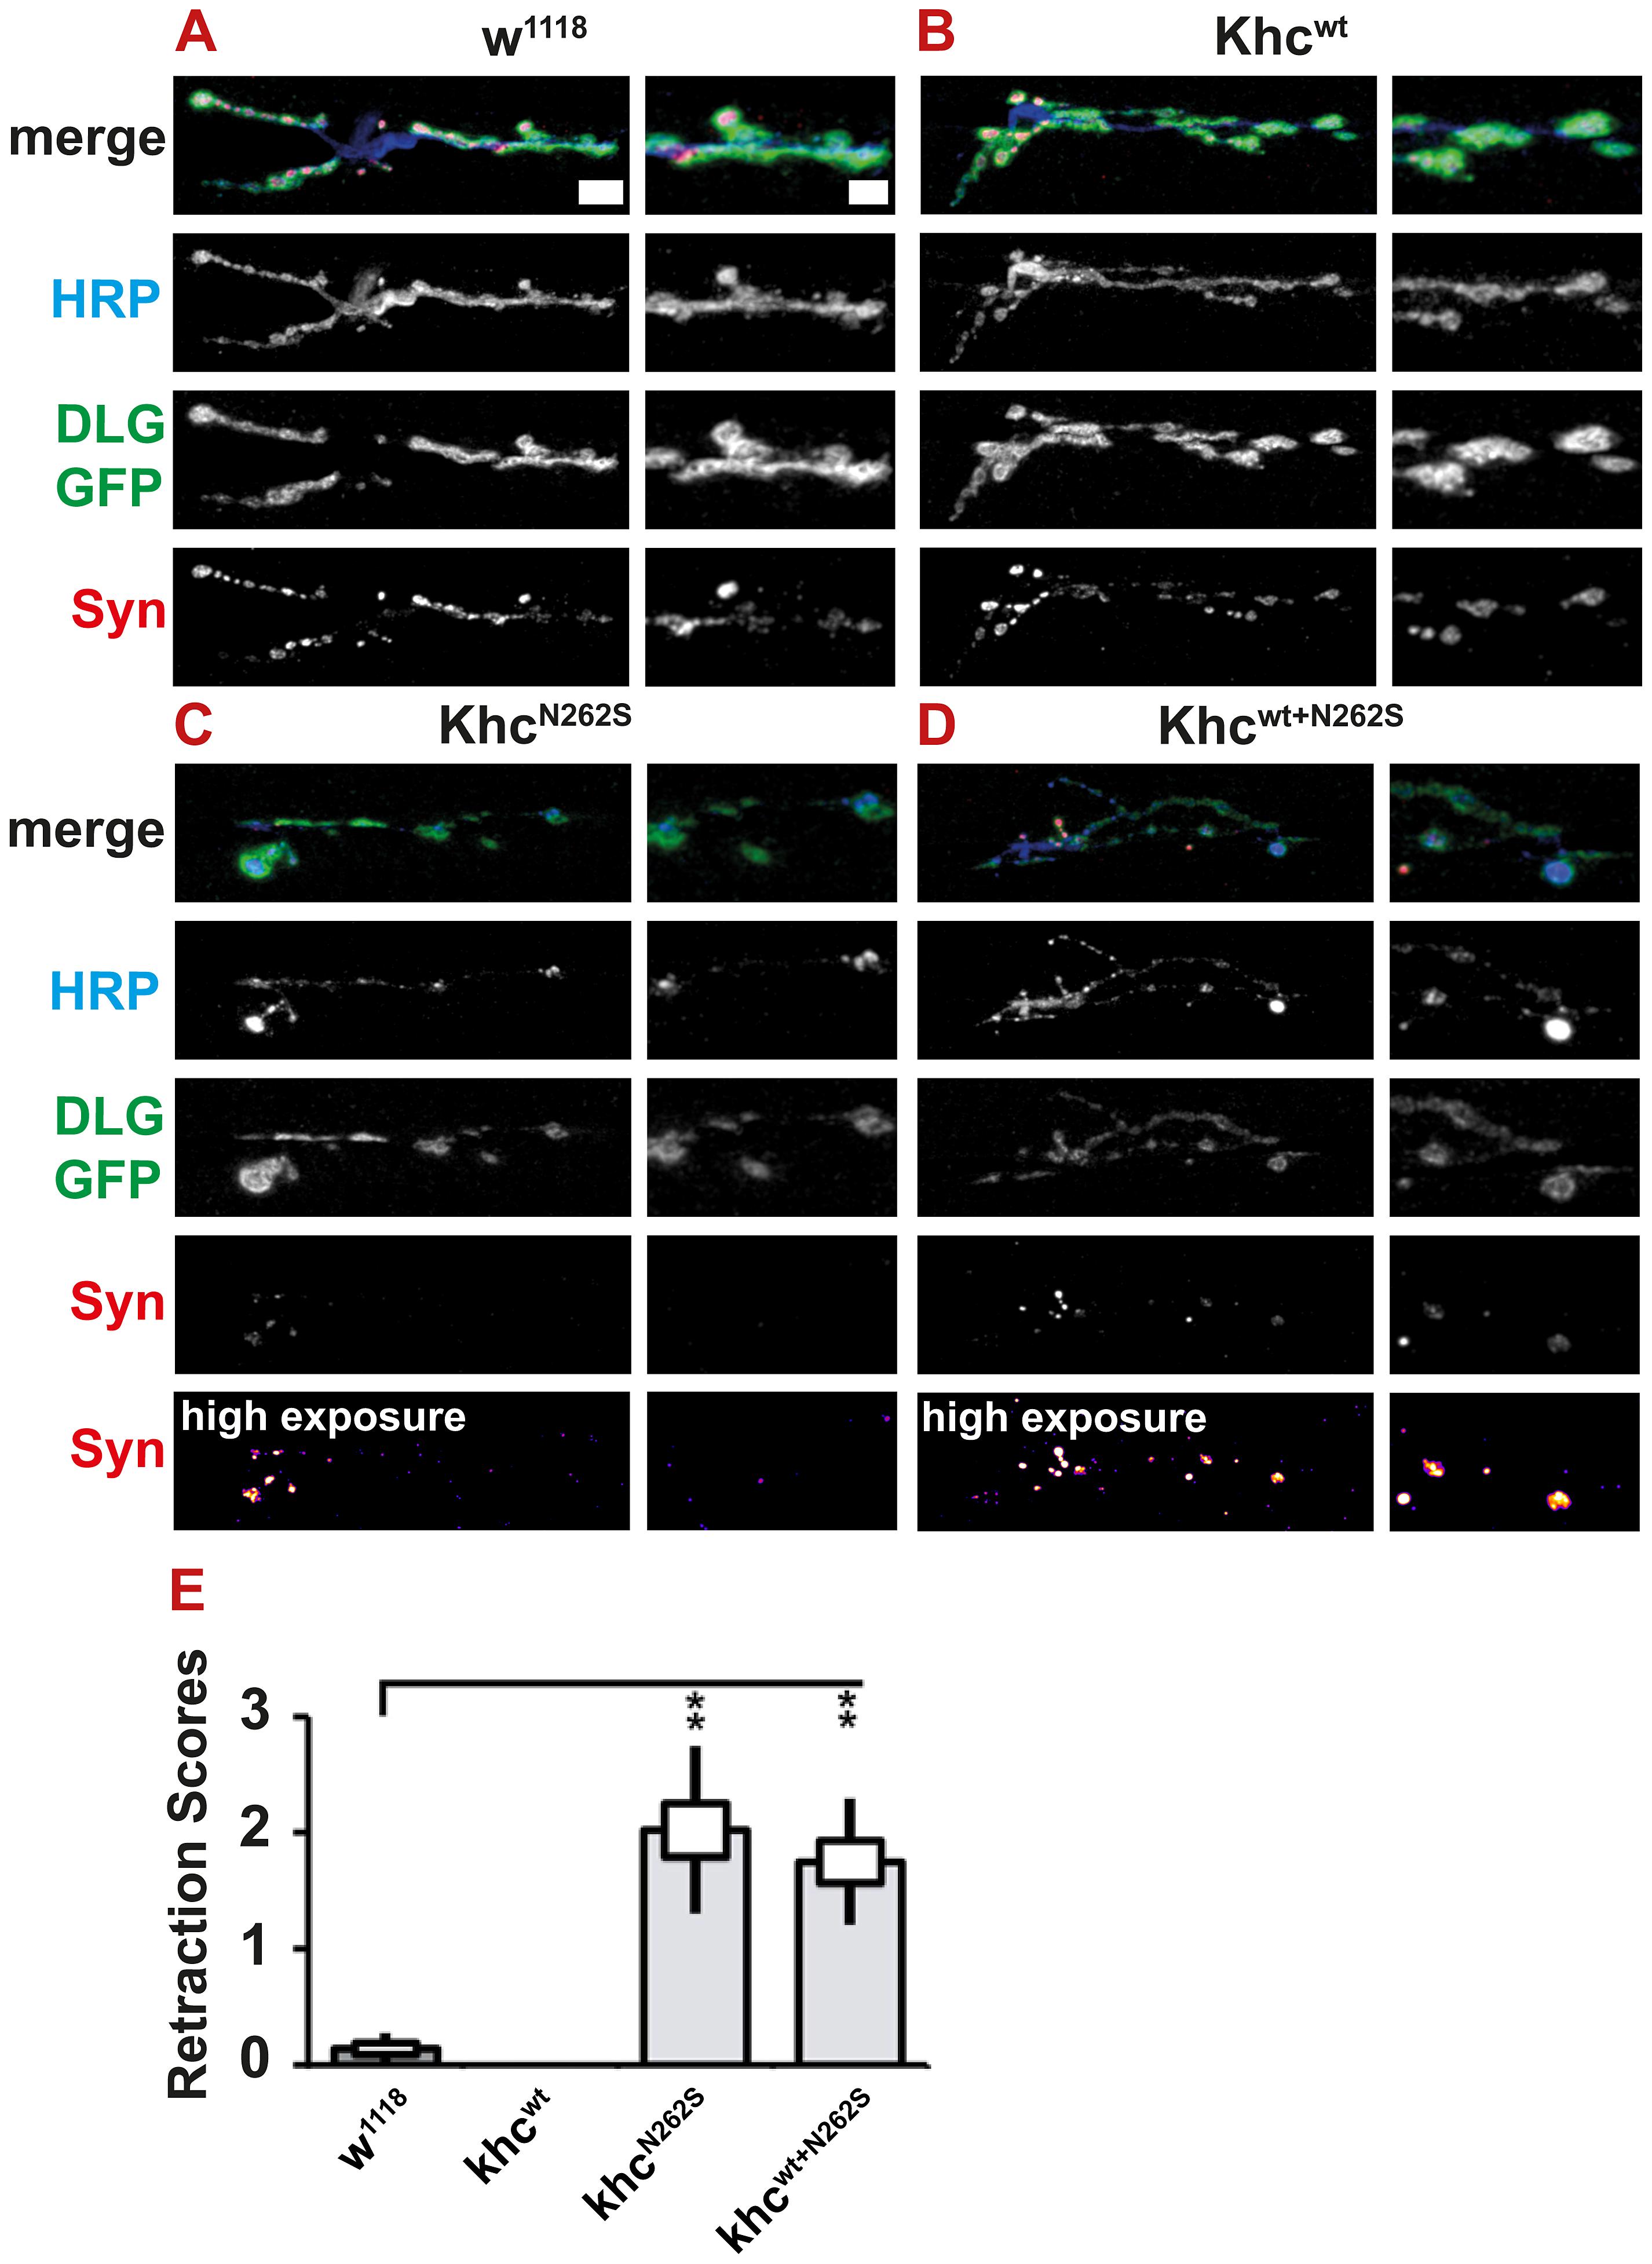 Light microscopic analysis of NMJ degeneration.